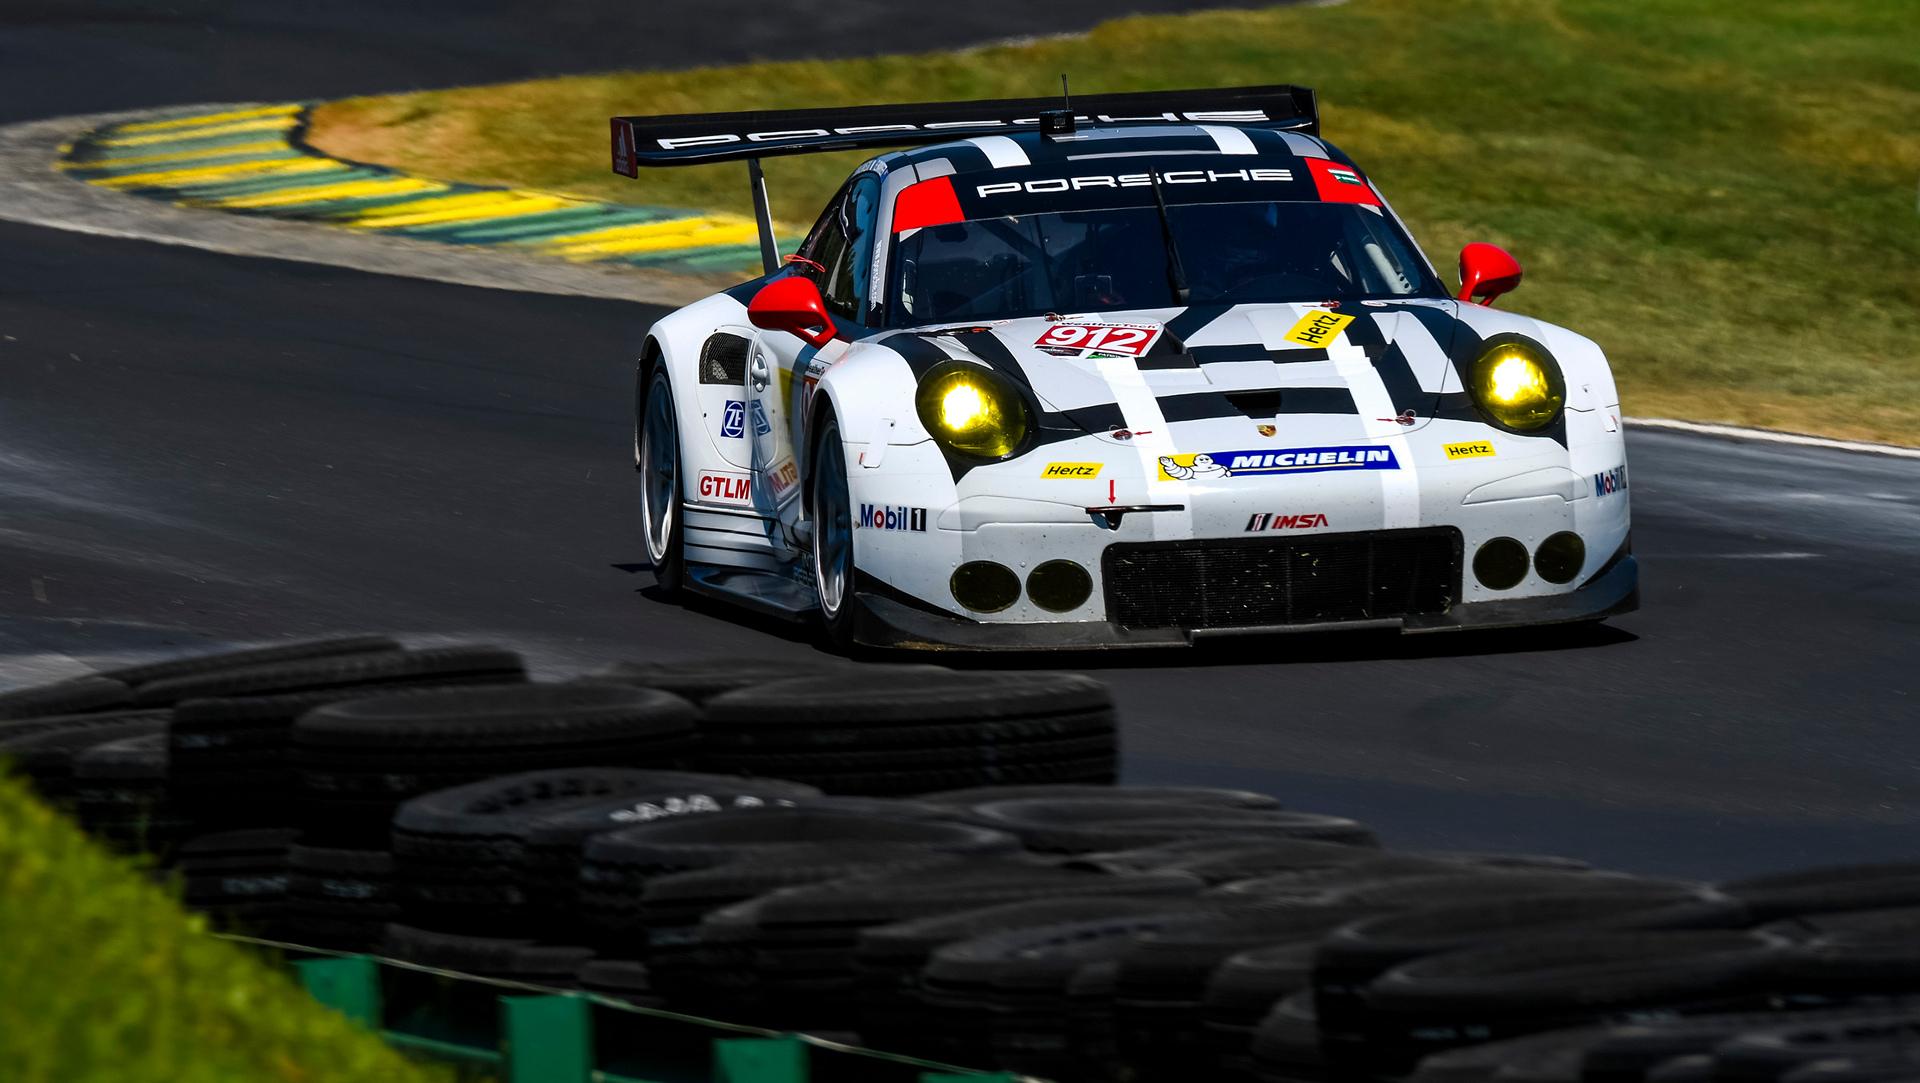 Porsche 911 RSR © Dr. Ing. h.c. F. Porsche AG